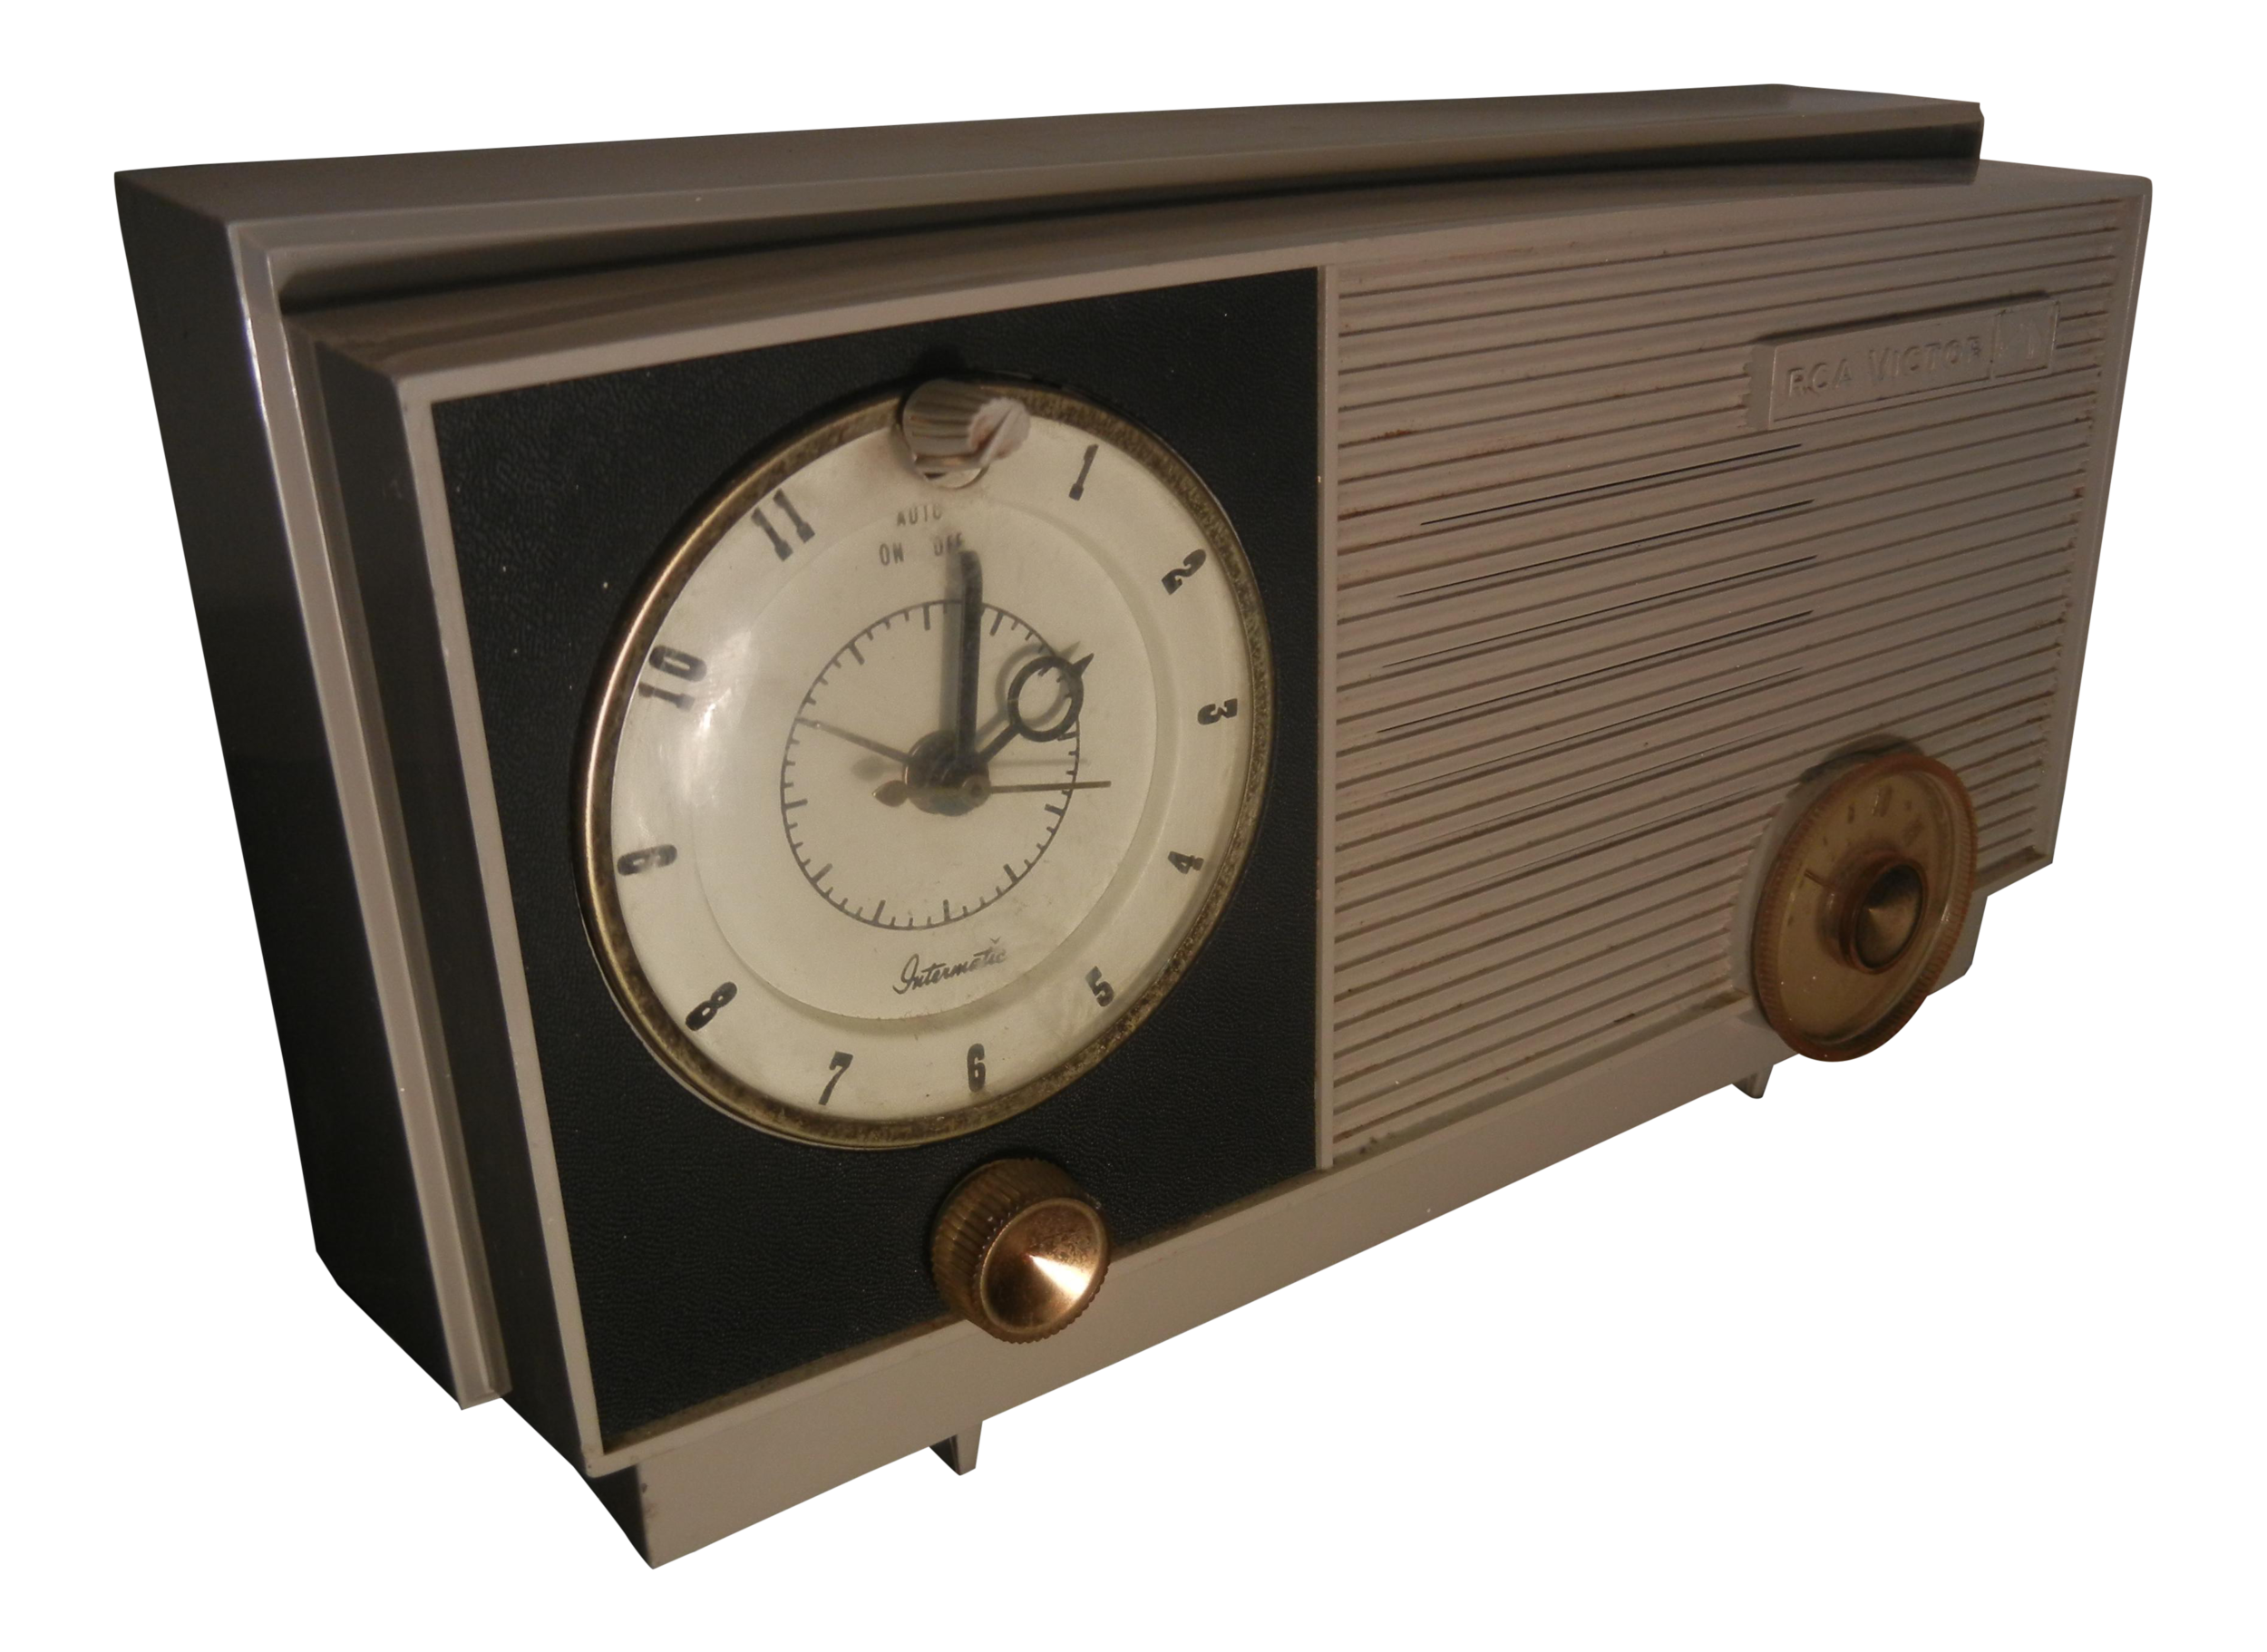 Vintage Clocks retro style00019.png